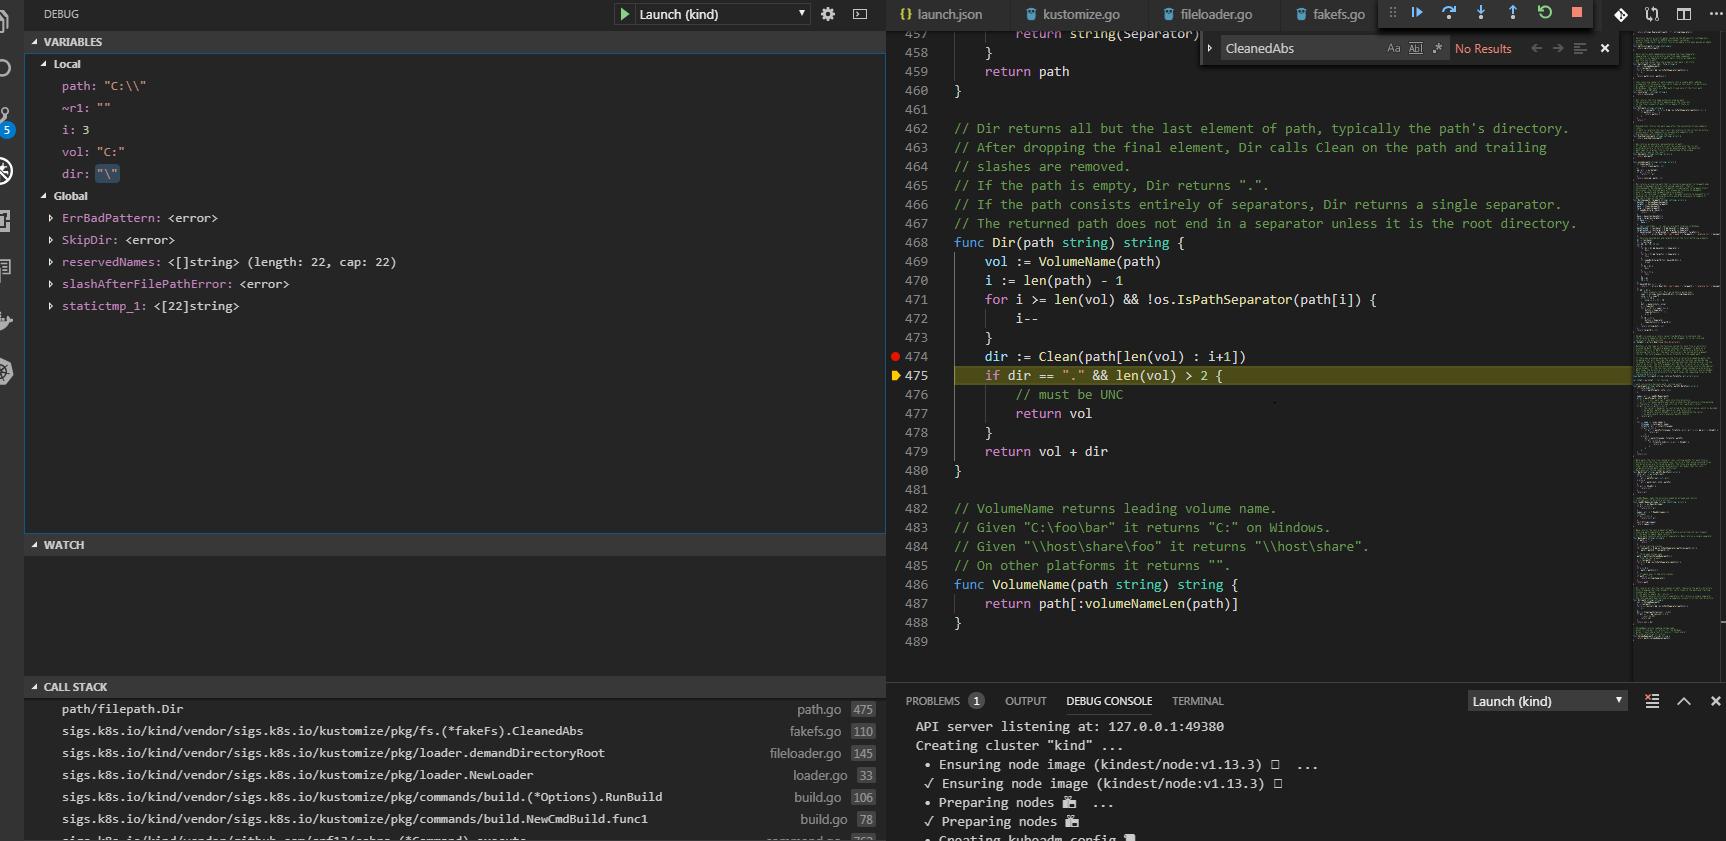 Errors running kind on windows 7 using docker toolbox